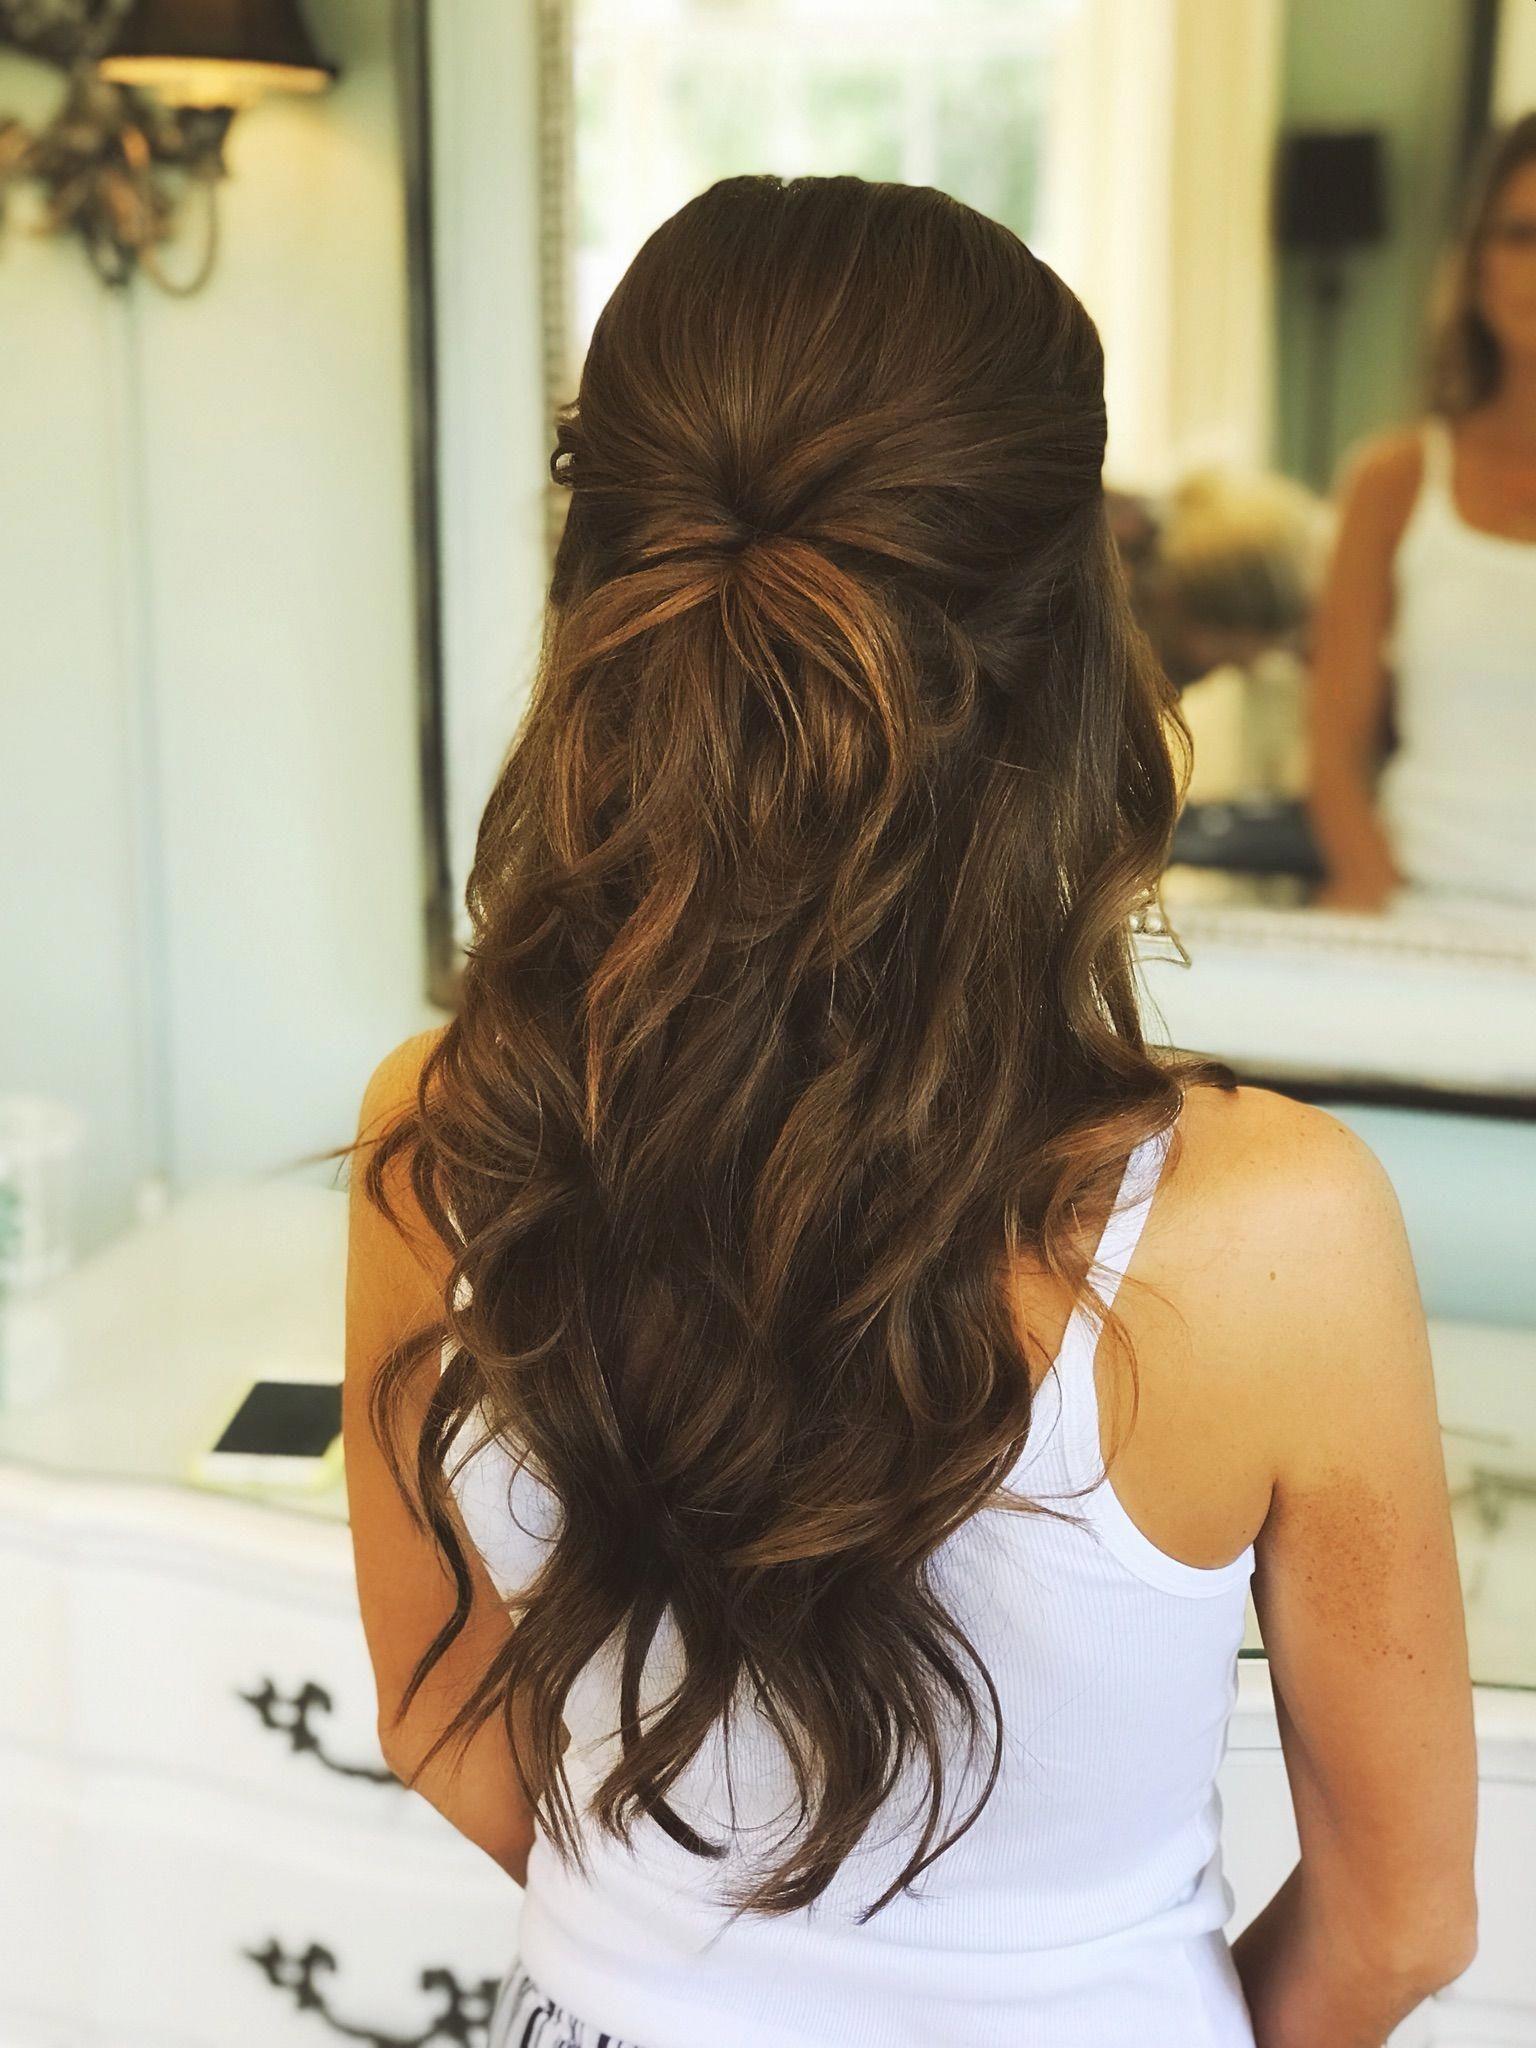 Half Up Wedding Hair Romantic Soft Curls Bridal Bridehair Hair Styles Half Up Wedding Hair Wedding Hairstyles